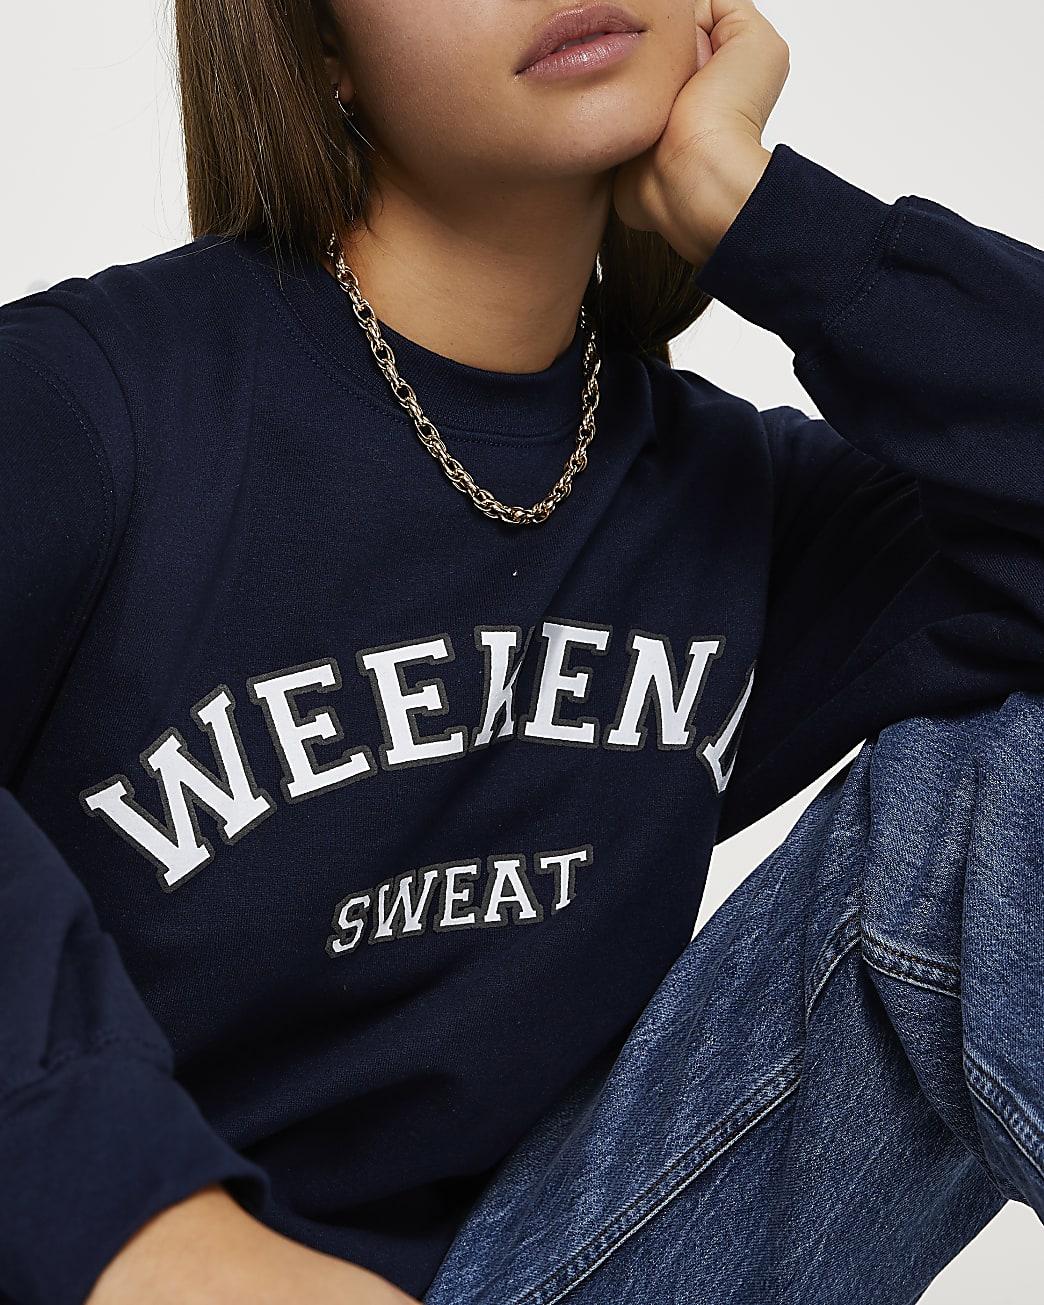 Navy 'Weekend Sweat' long sleeve sweatshirt